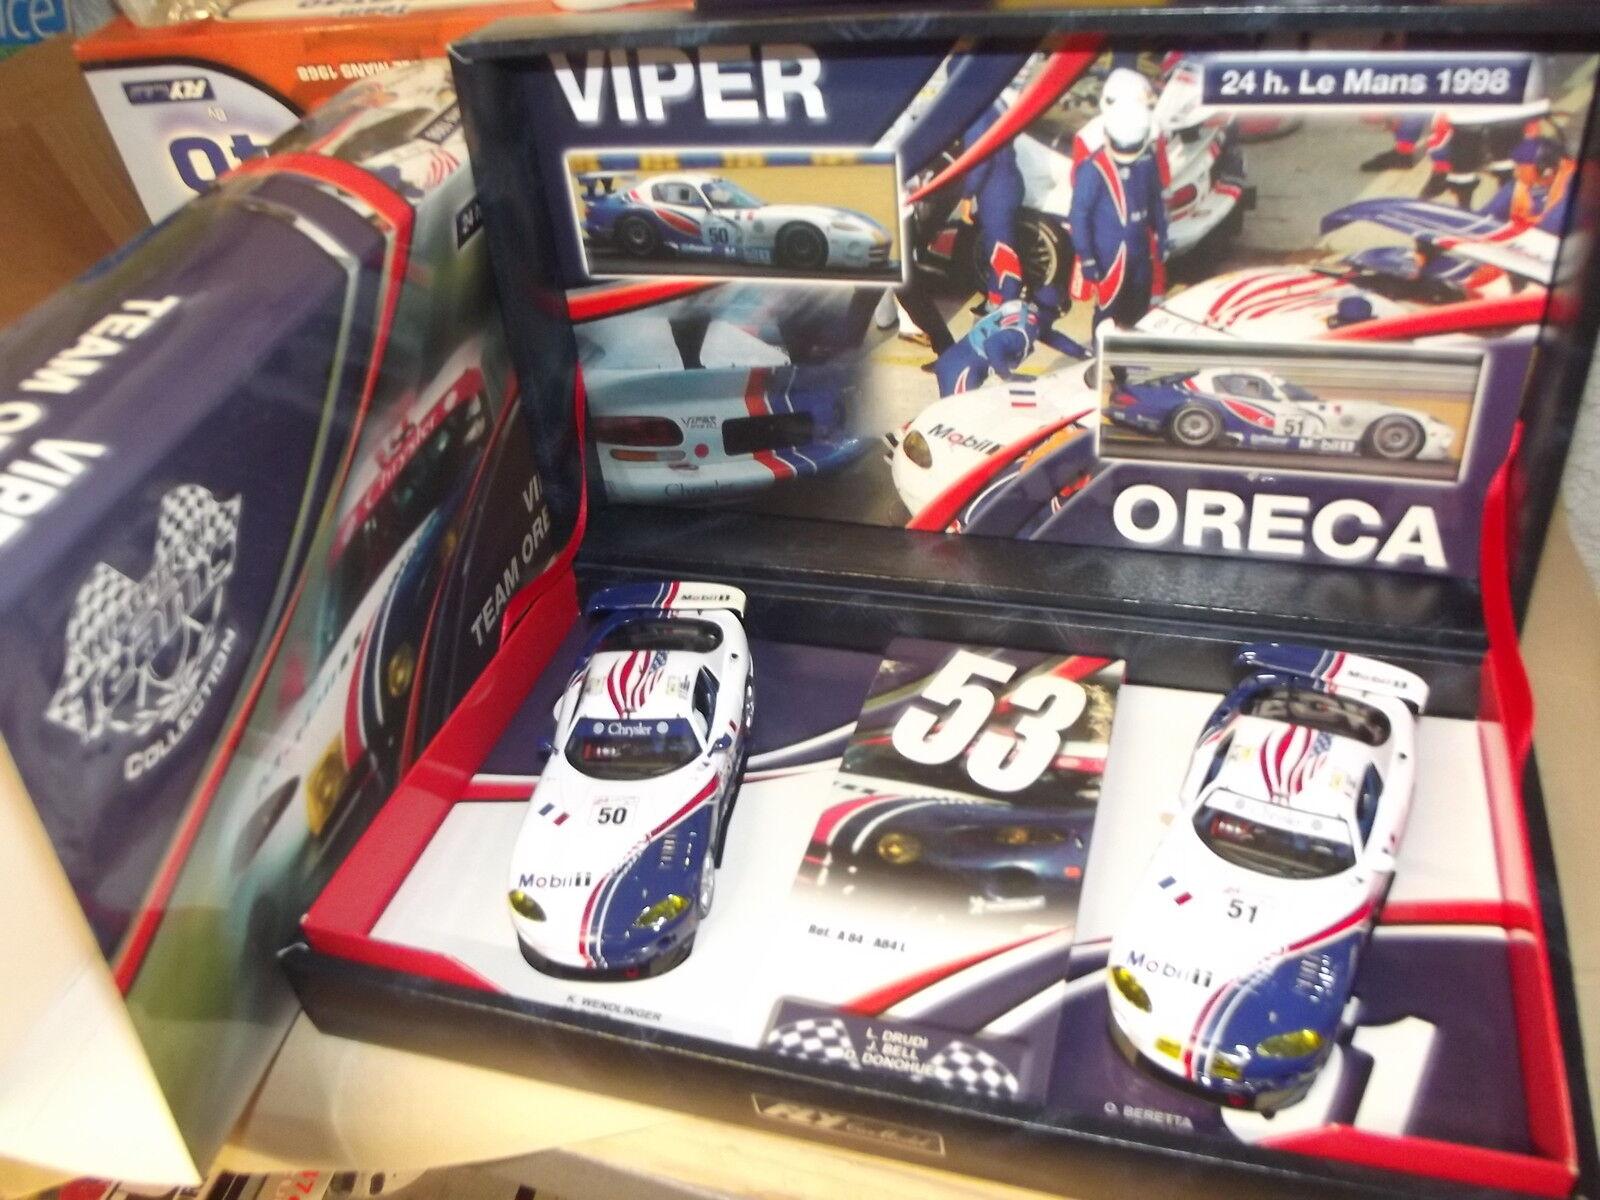 VIPER TEAM ORECA- 24H LE MANS 1998-TEAM 7-96040-FLY-CAR-MODEL-SLOT-1 32-E19